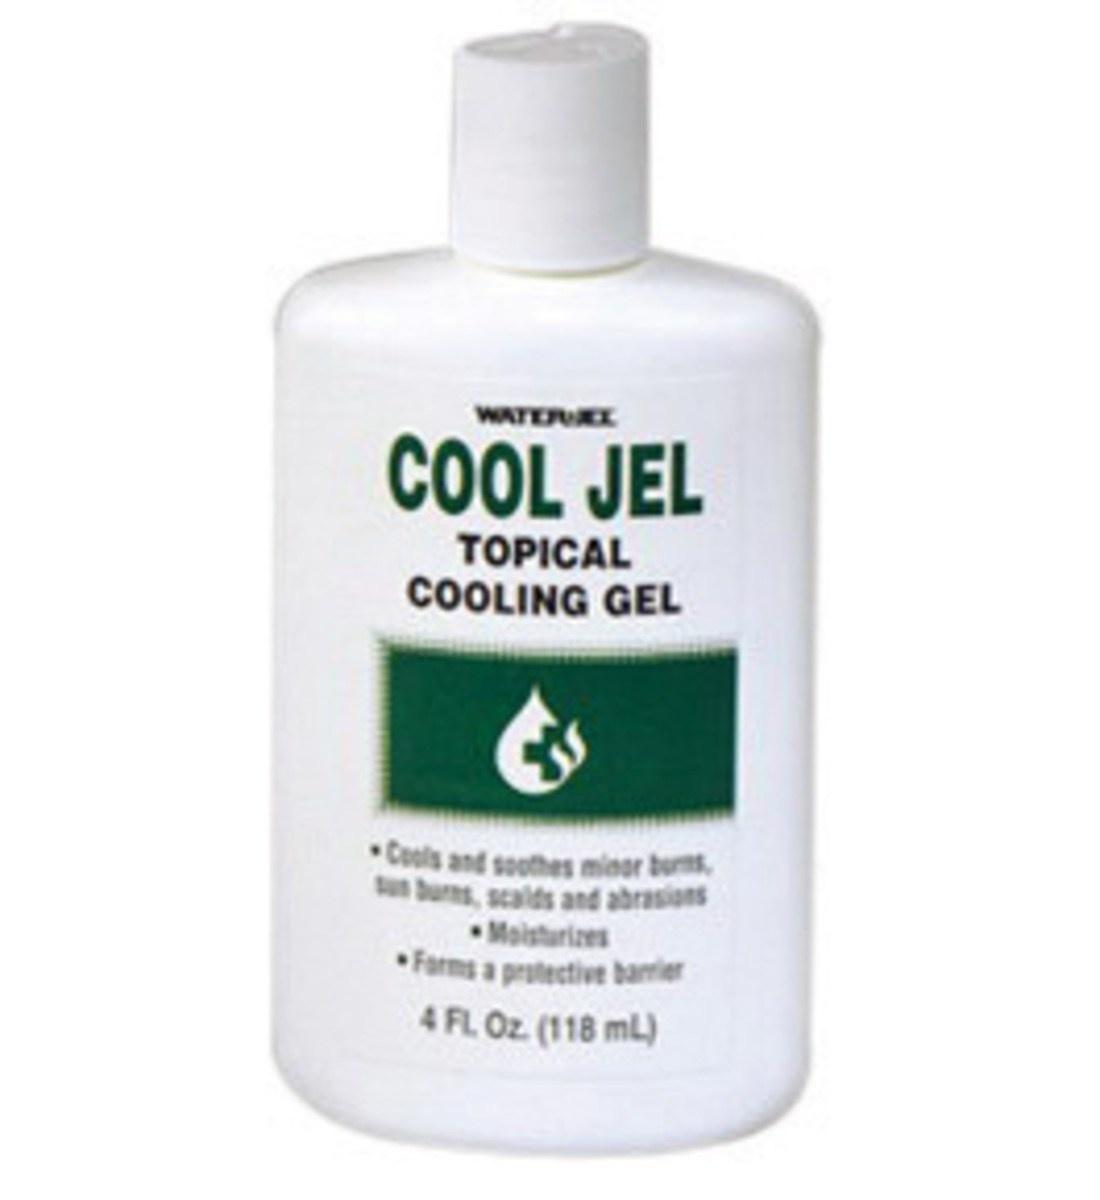 WaterJel Topical Cooling Gel 4fl oz. 118ml